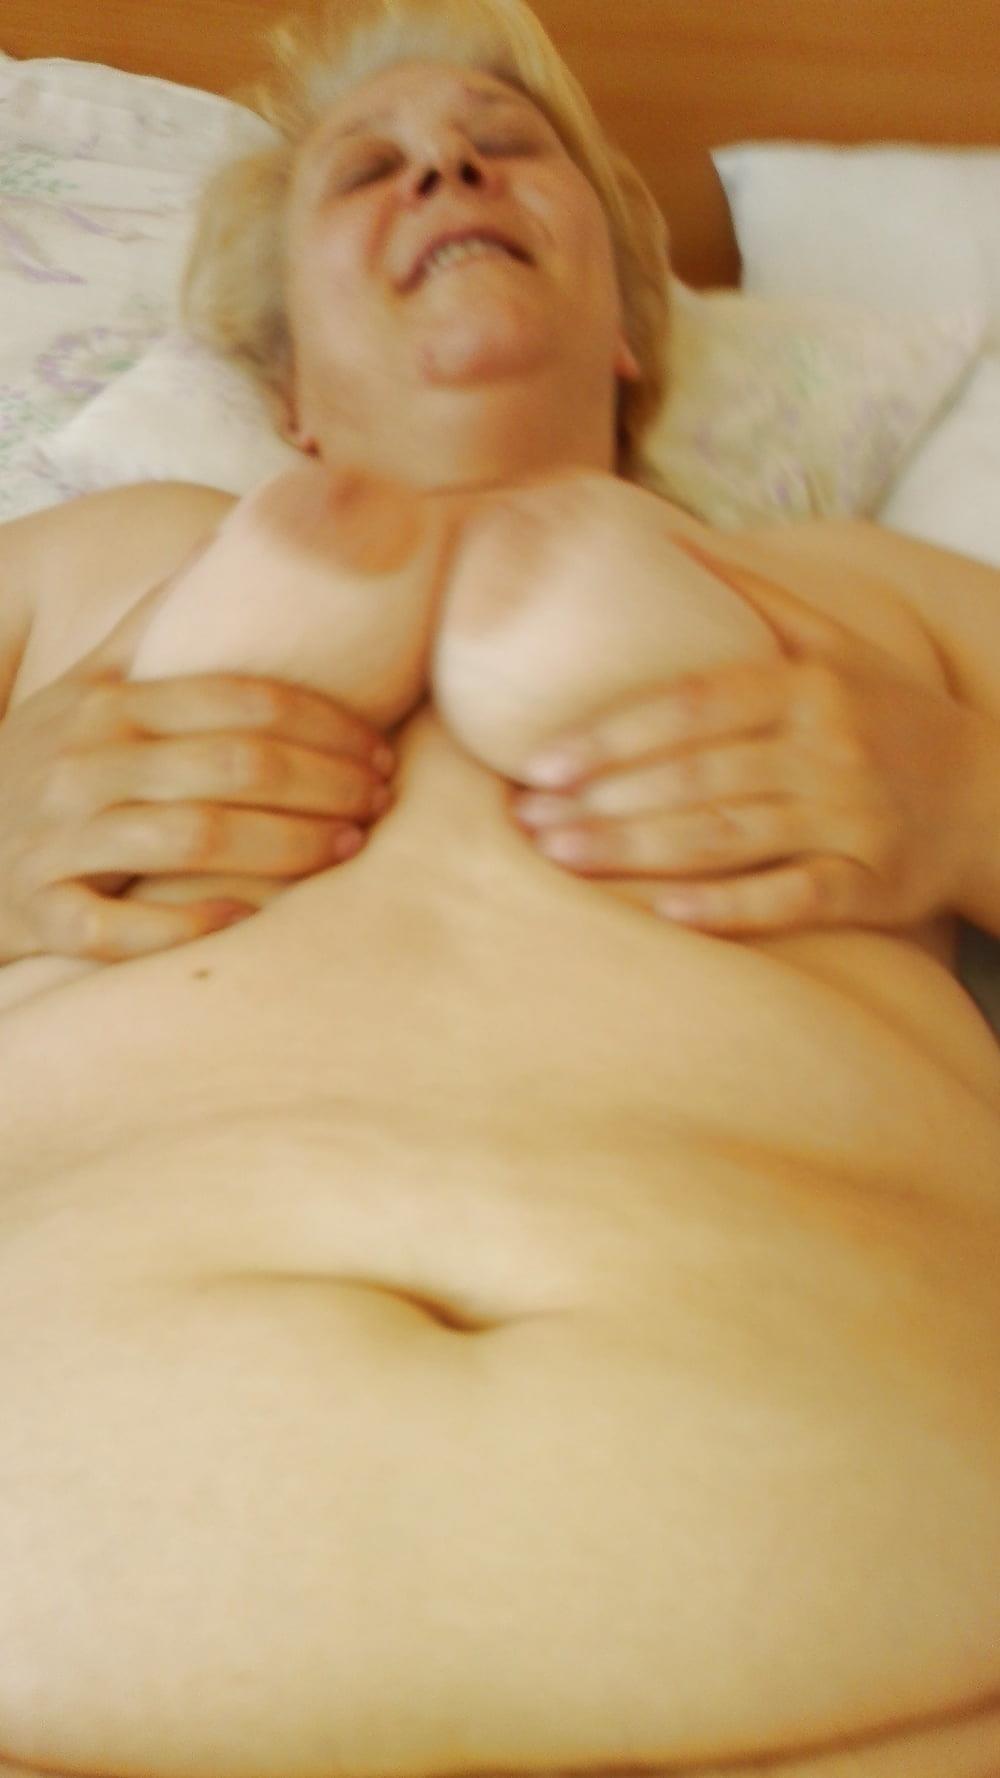 Big tits creampie pics-6908